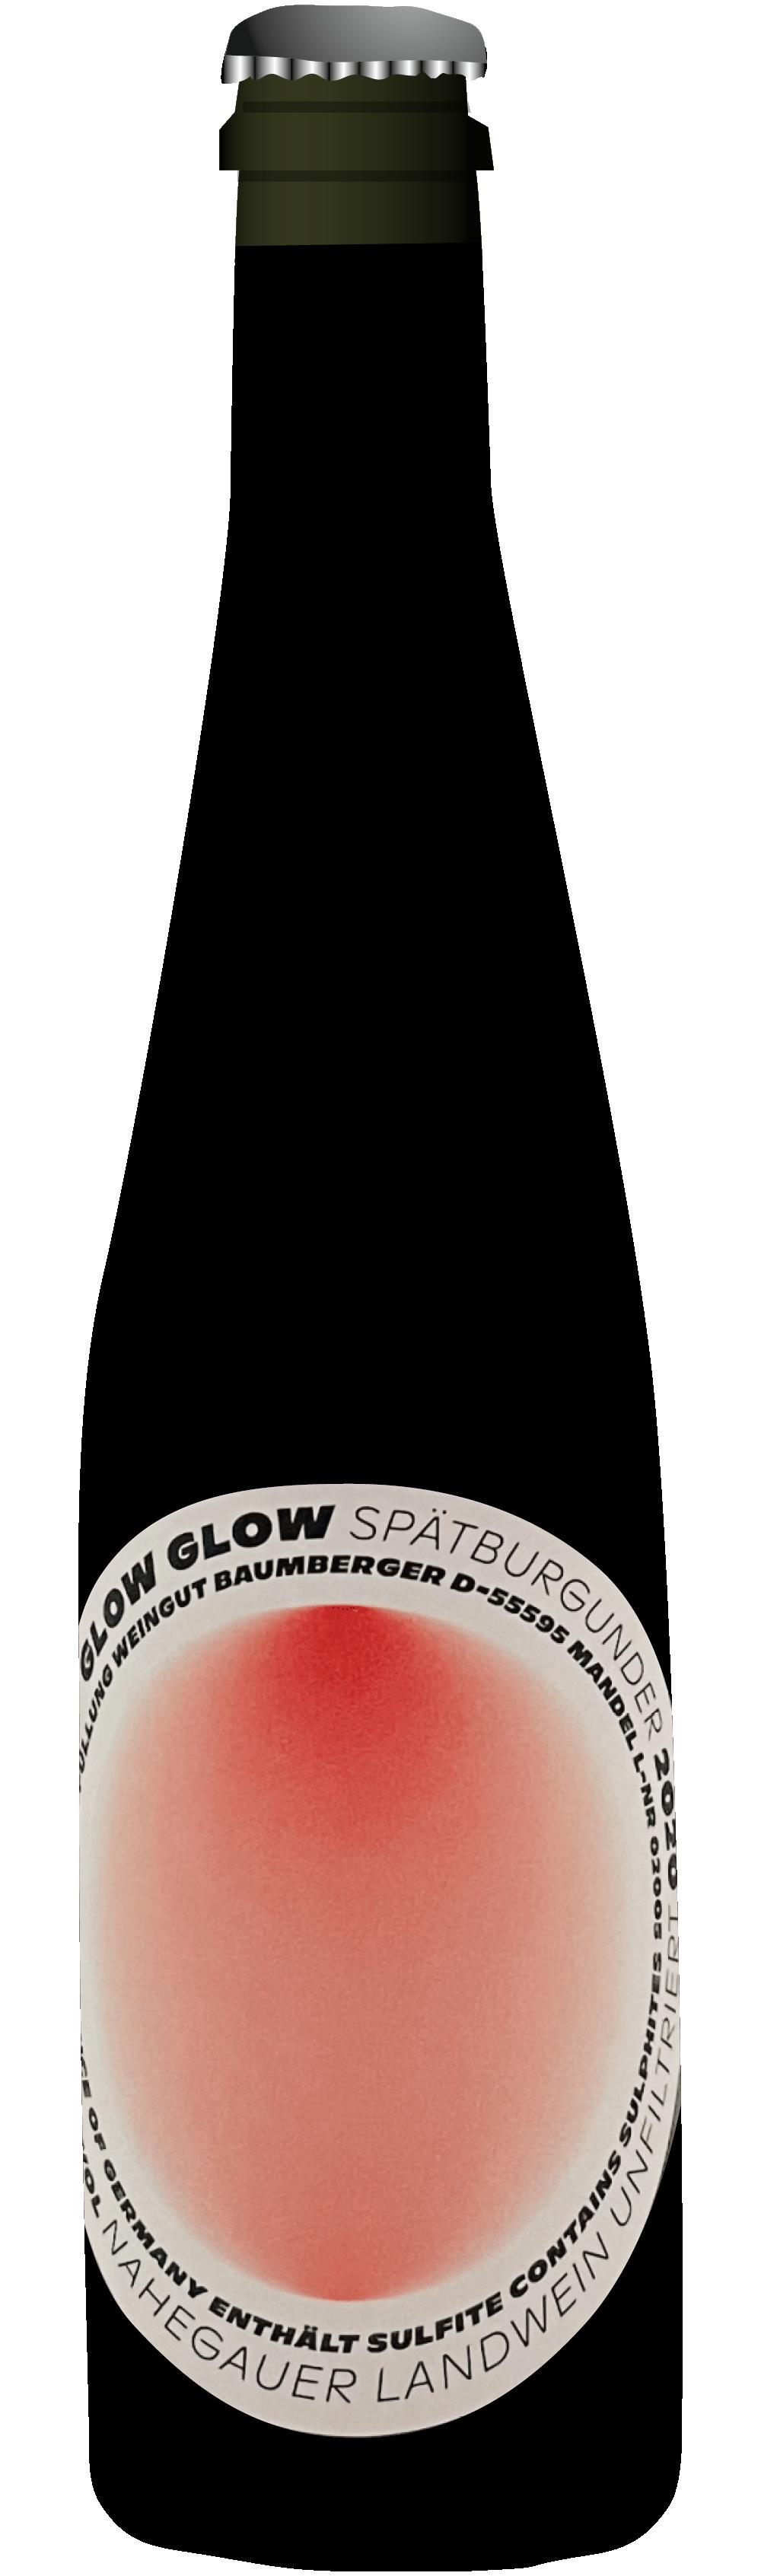 the natural wine company club may 2021 germany glow glow spatburgunder 2020